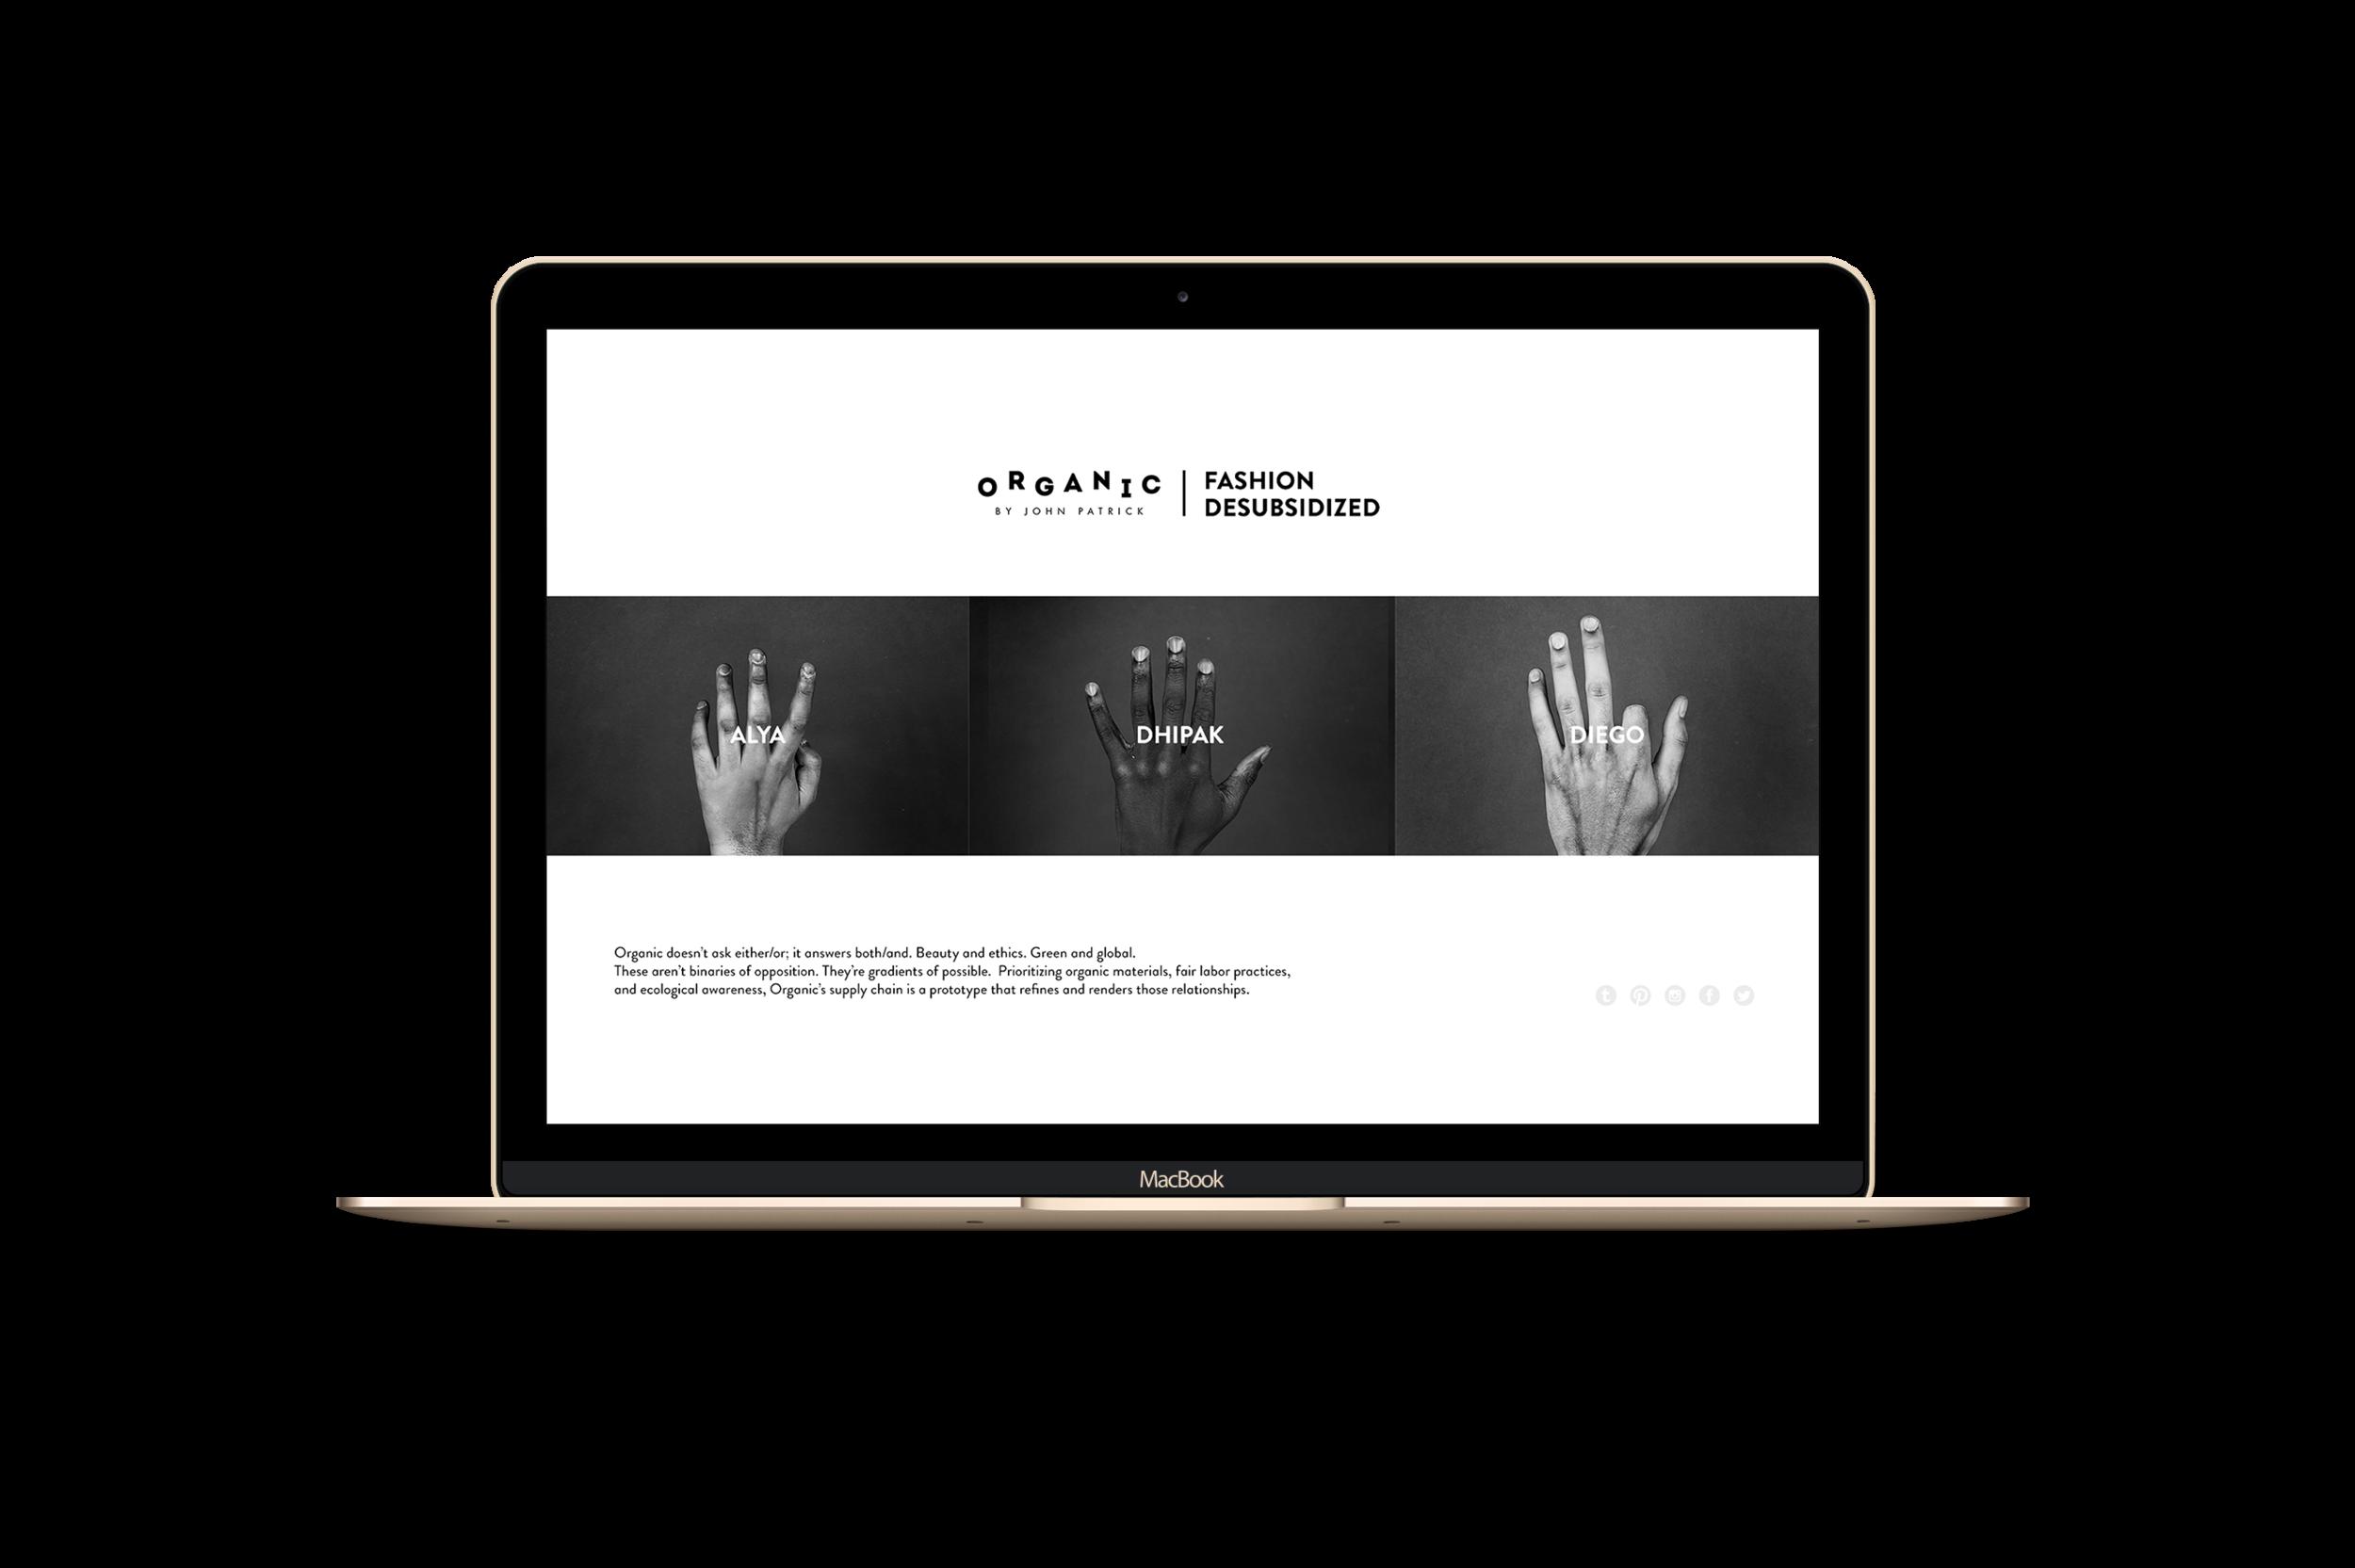 002-MacBook-Gold.png